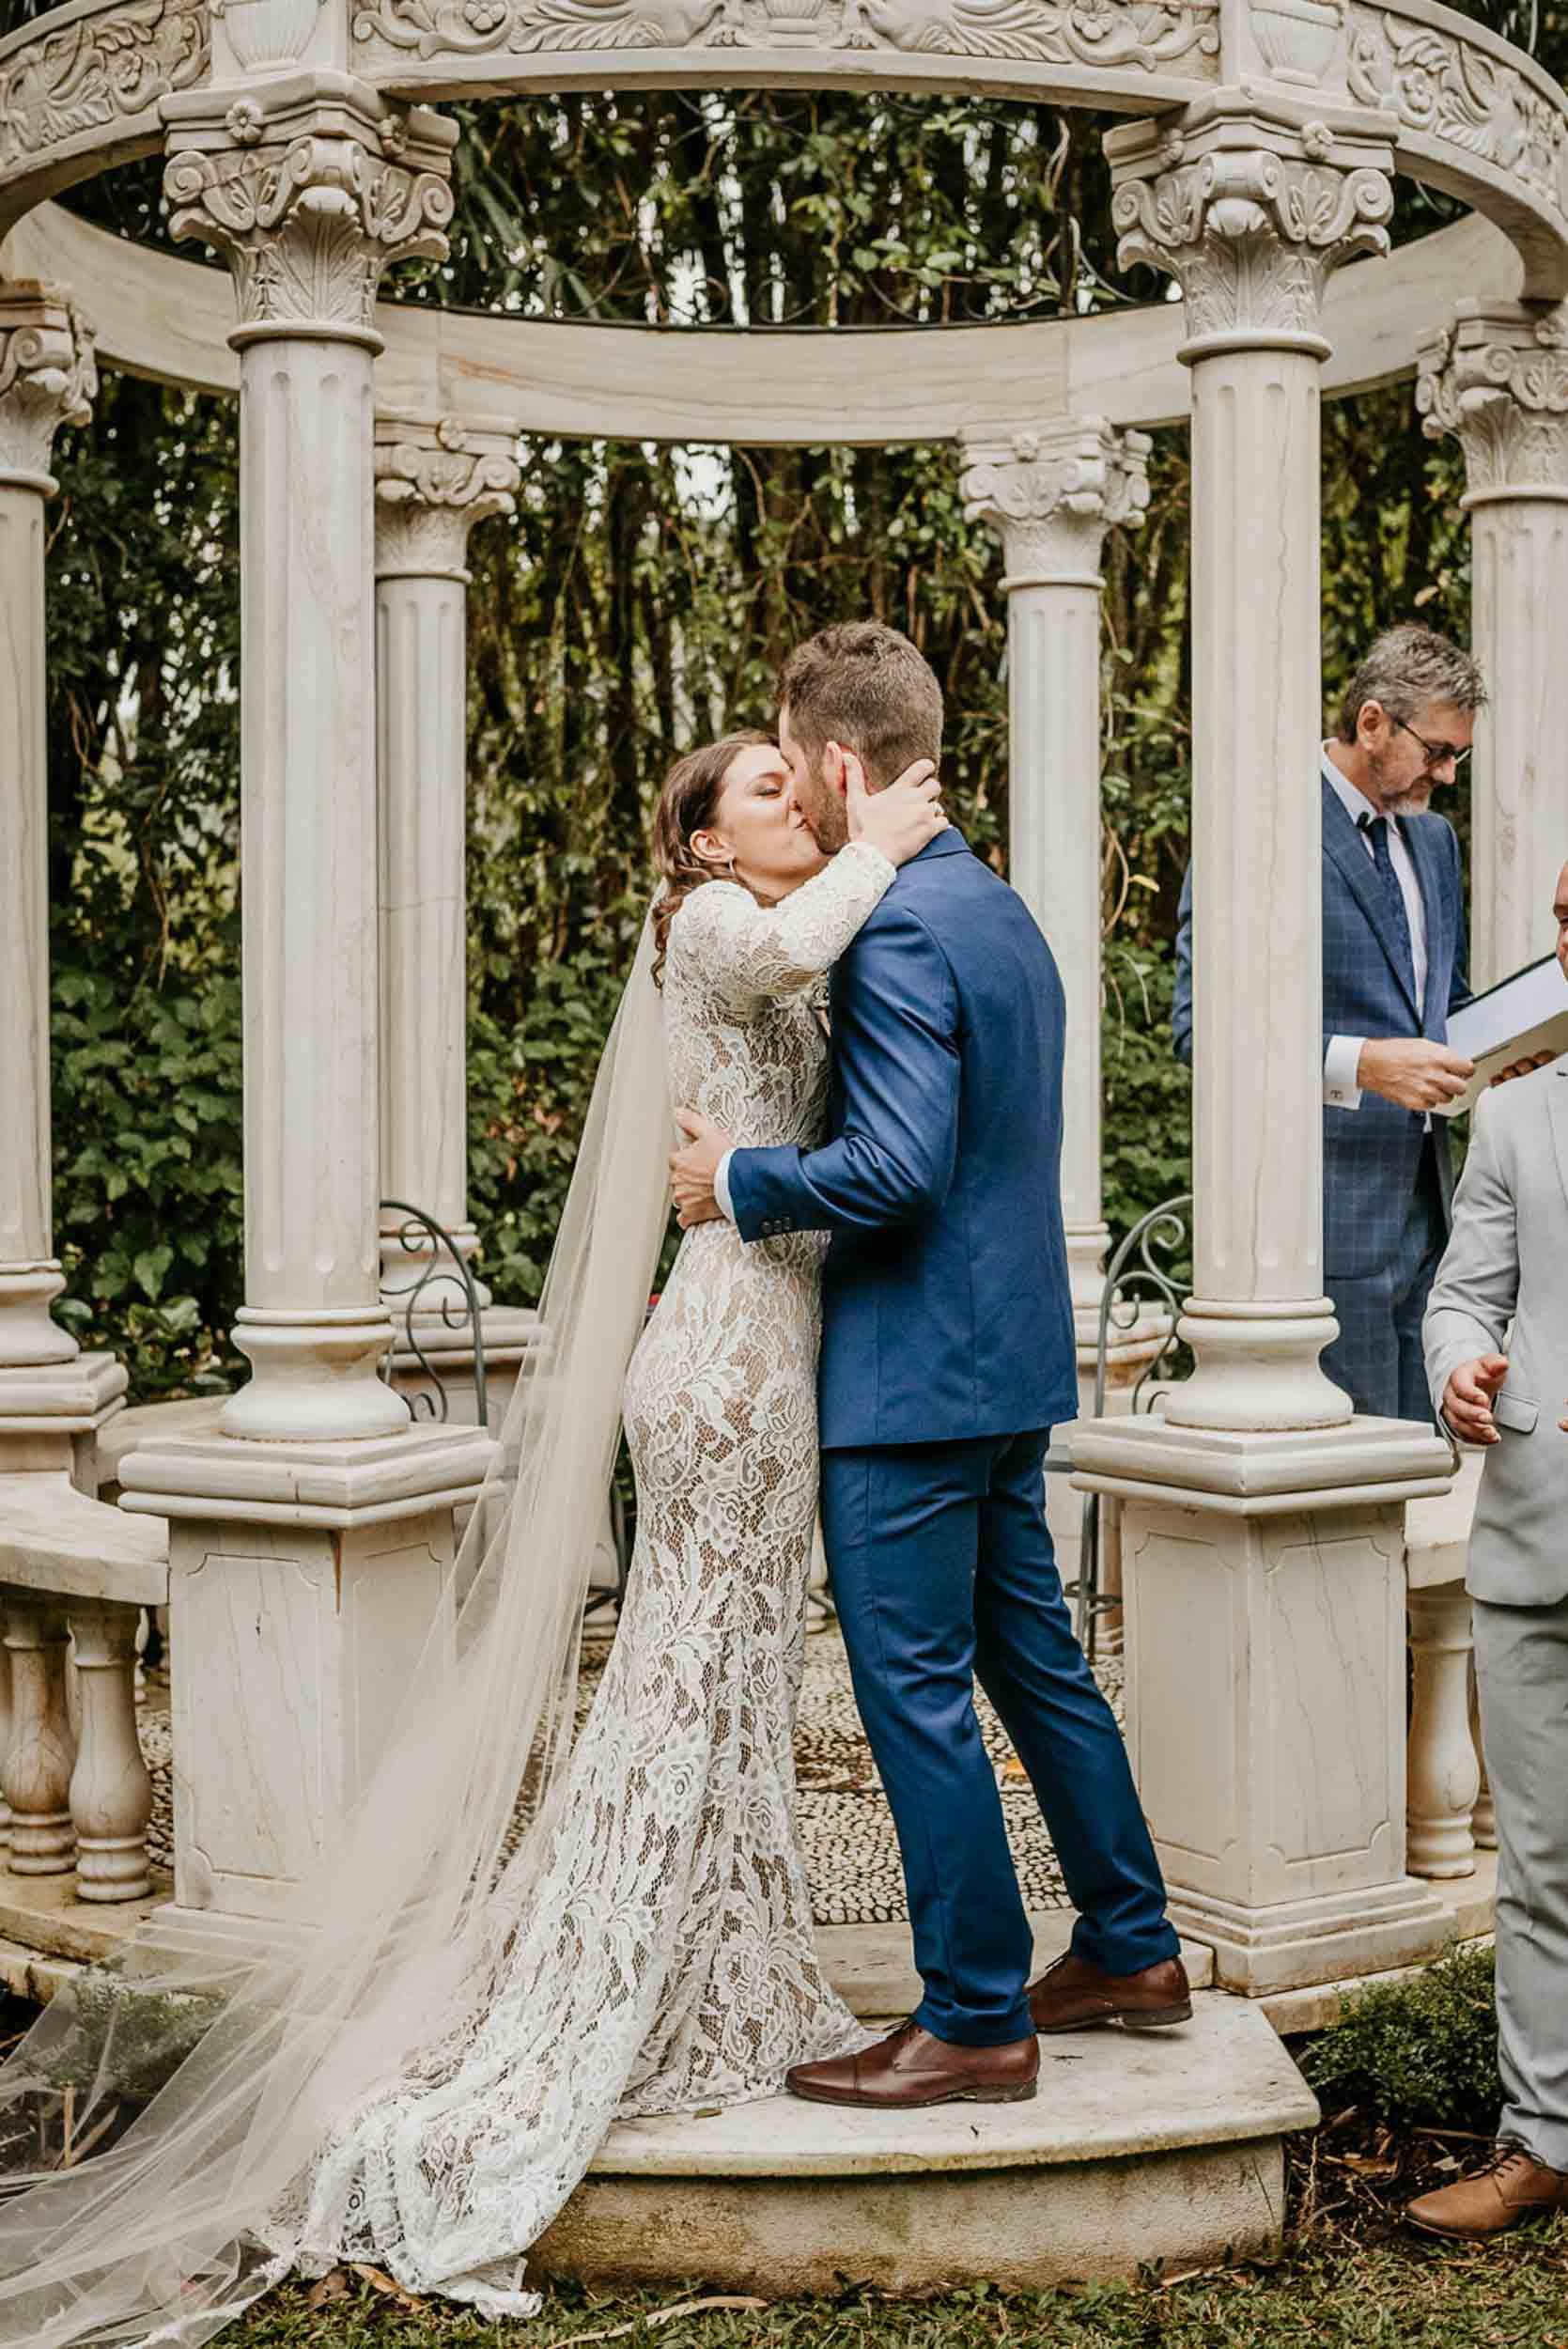 The Raw Photographer - Cairns Wedding Photographer - Laloli - Cairns Garden Wedding - Irene Costa's Devine Bridal-21.jpg